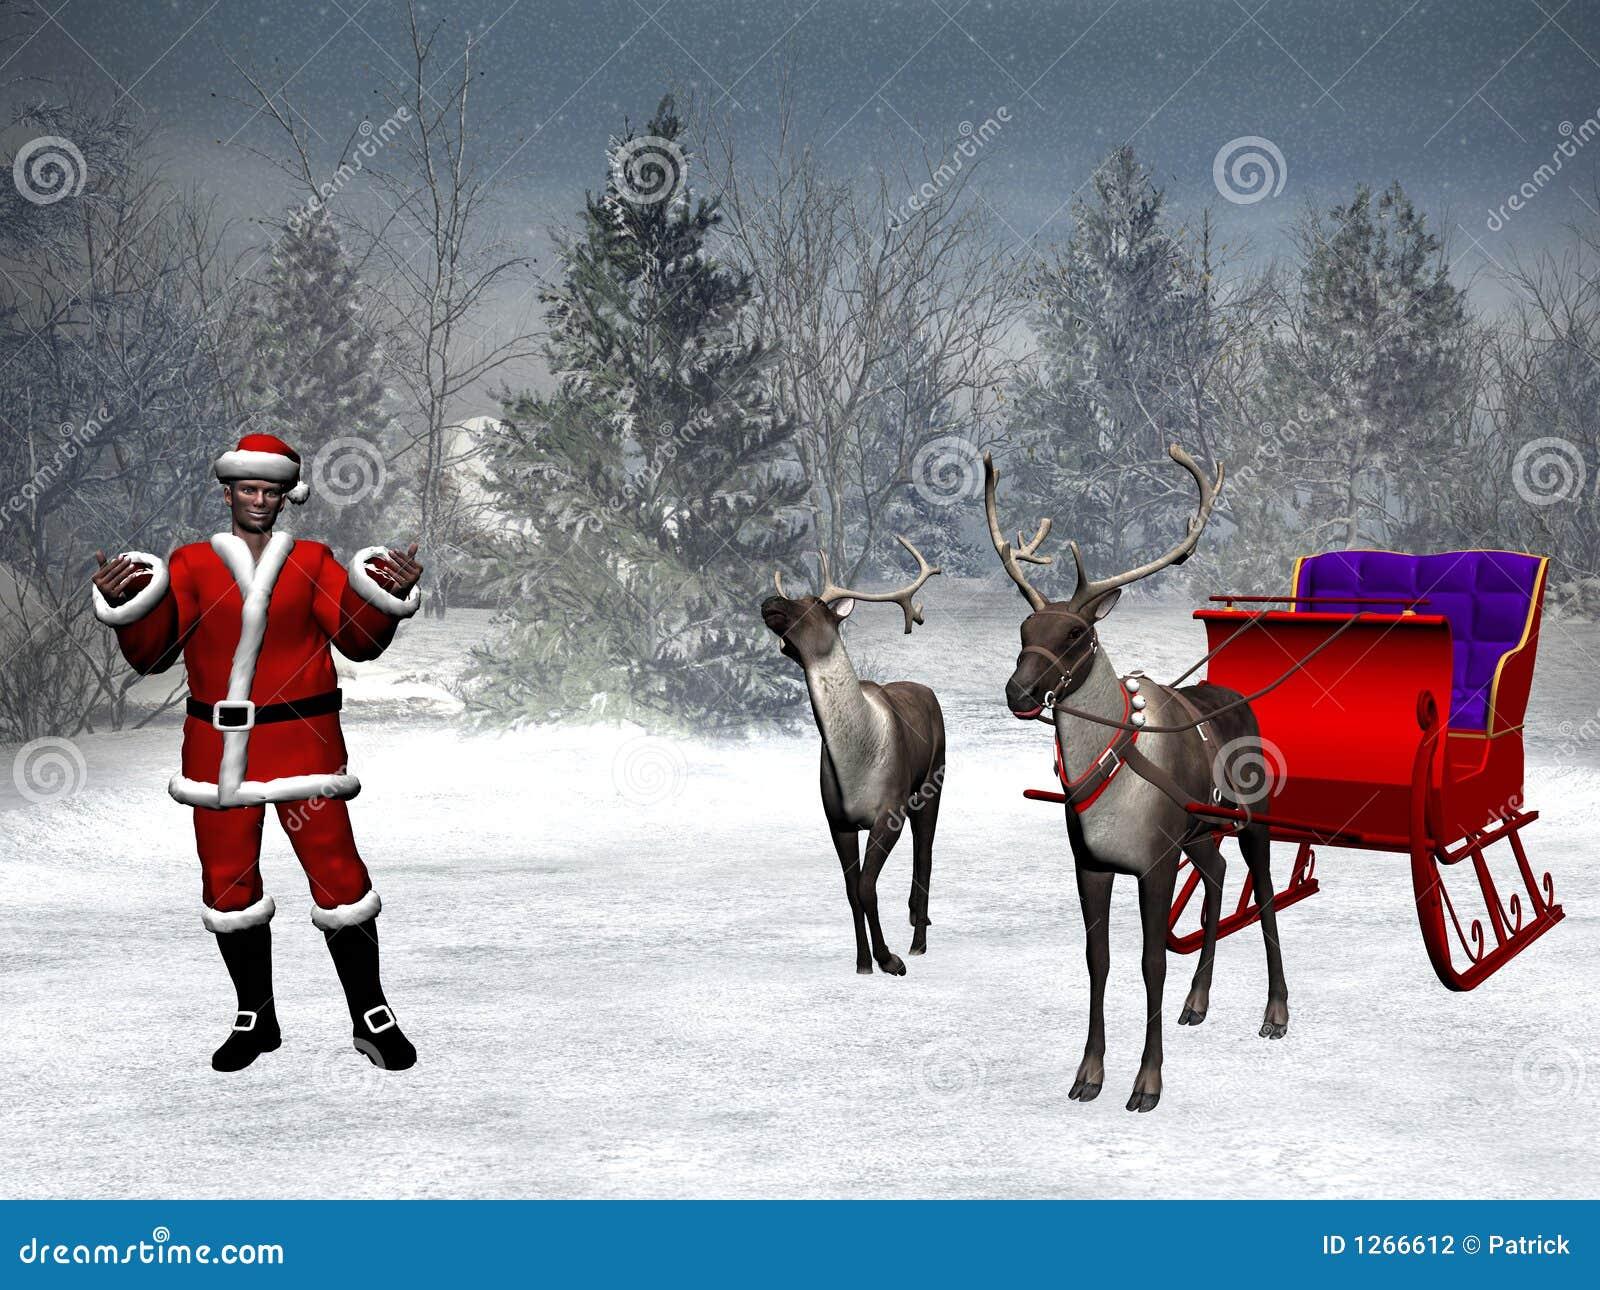 Xmas Reindeer Clipart